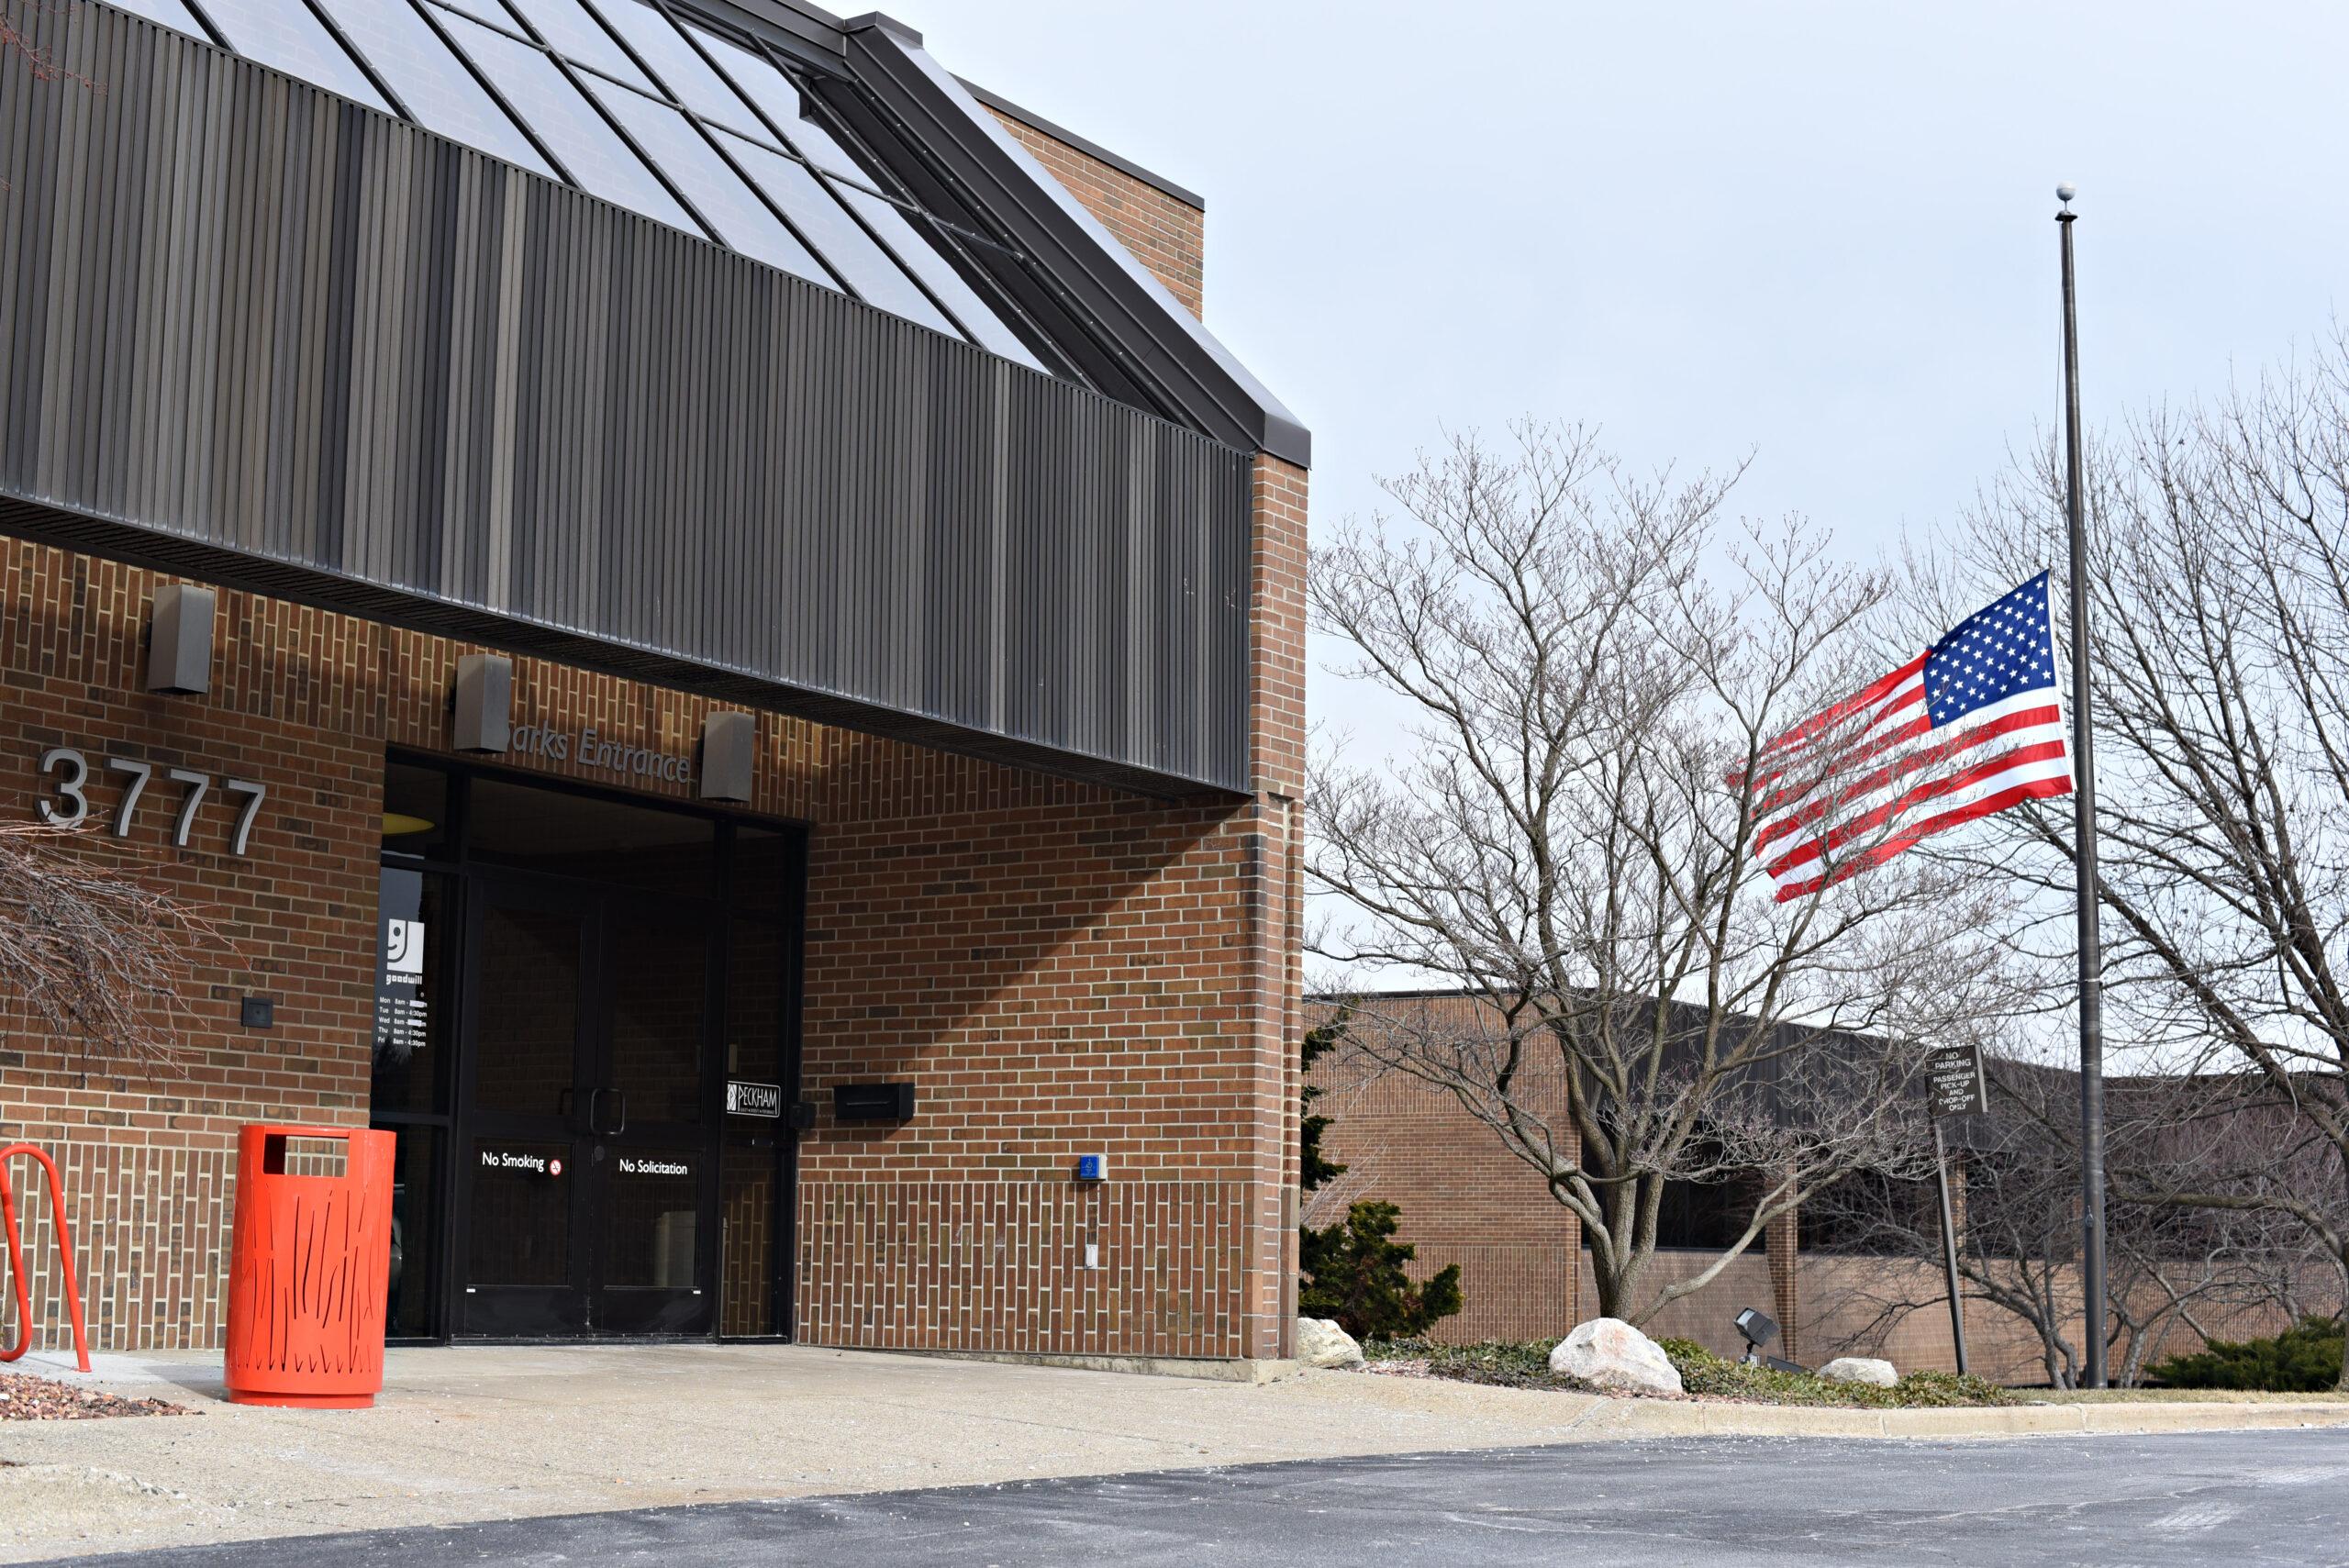 Our CNA Facility